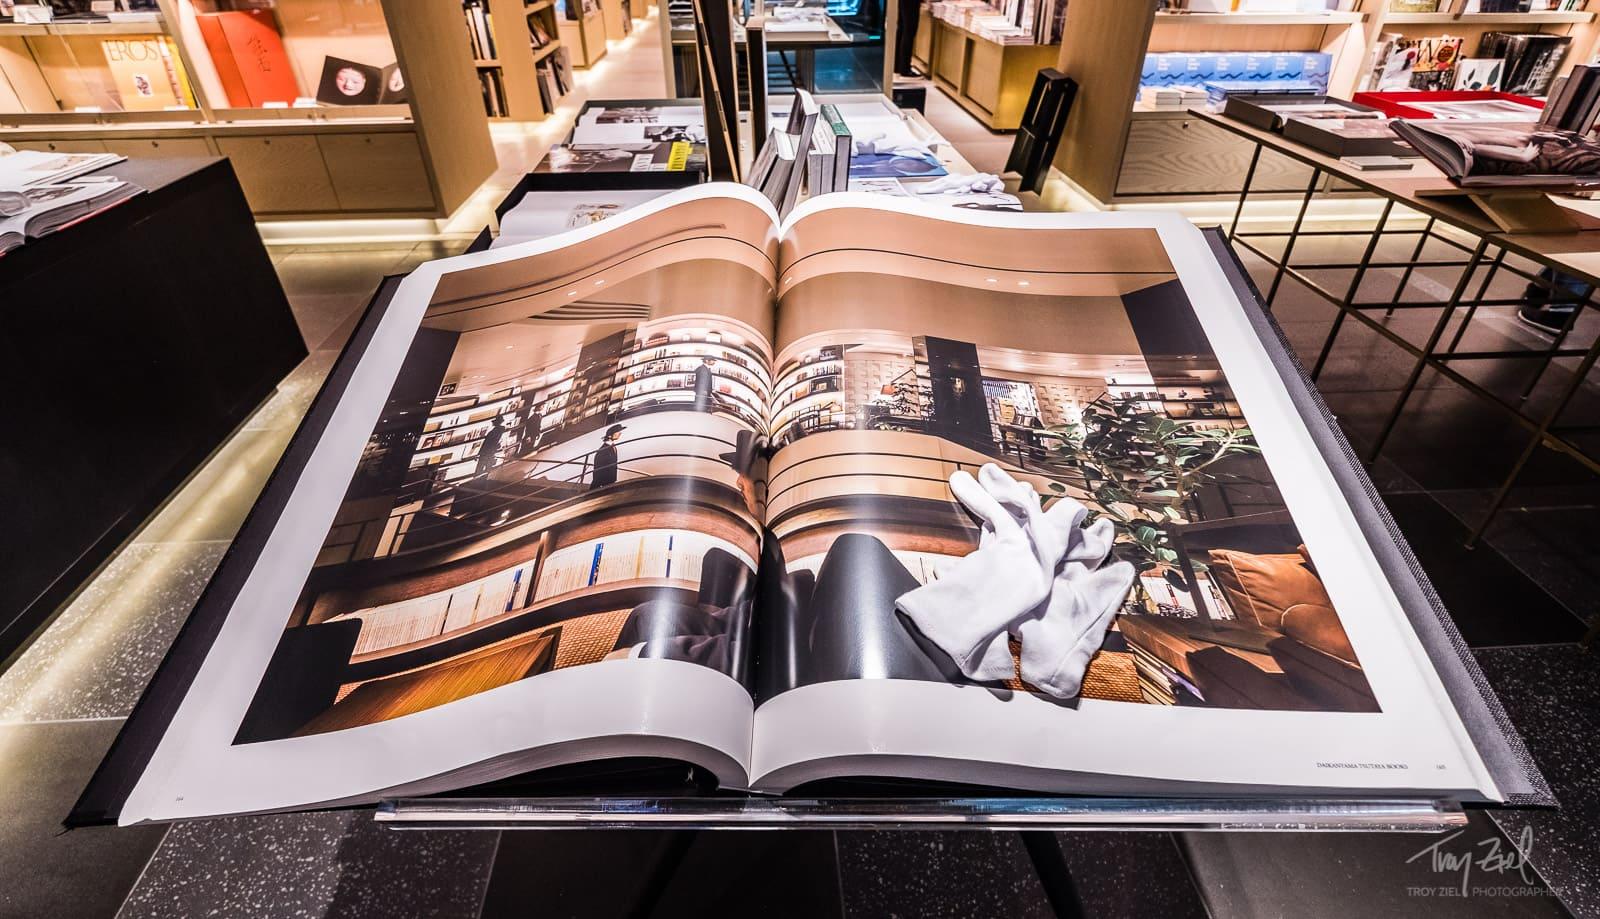 PhotographyBook-Troy Ziel-Print